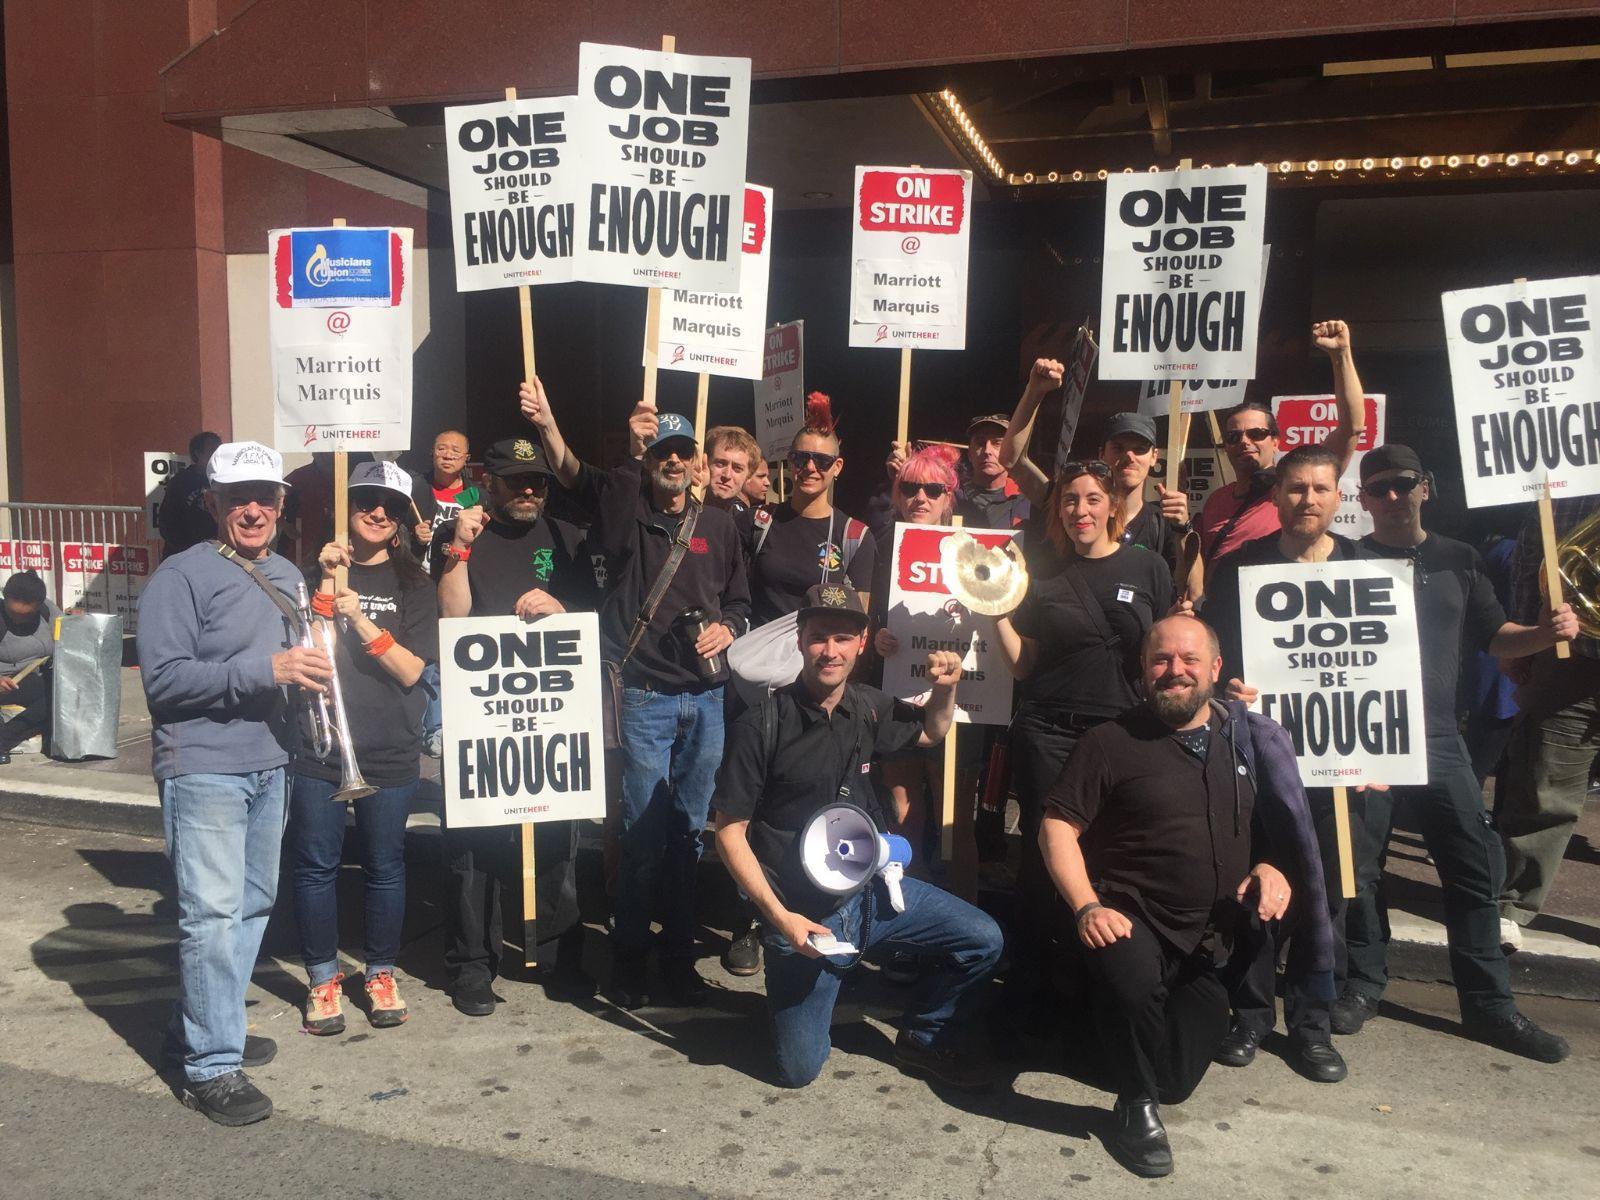 NN News Marriott strike image1-4